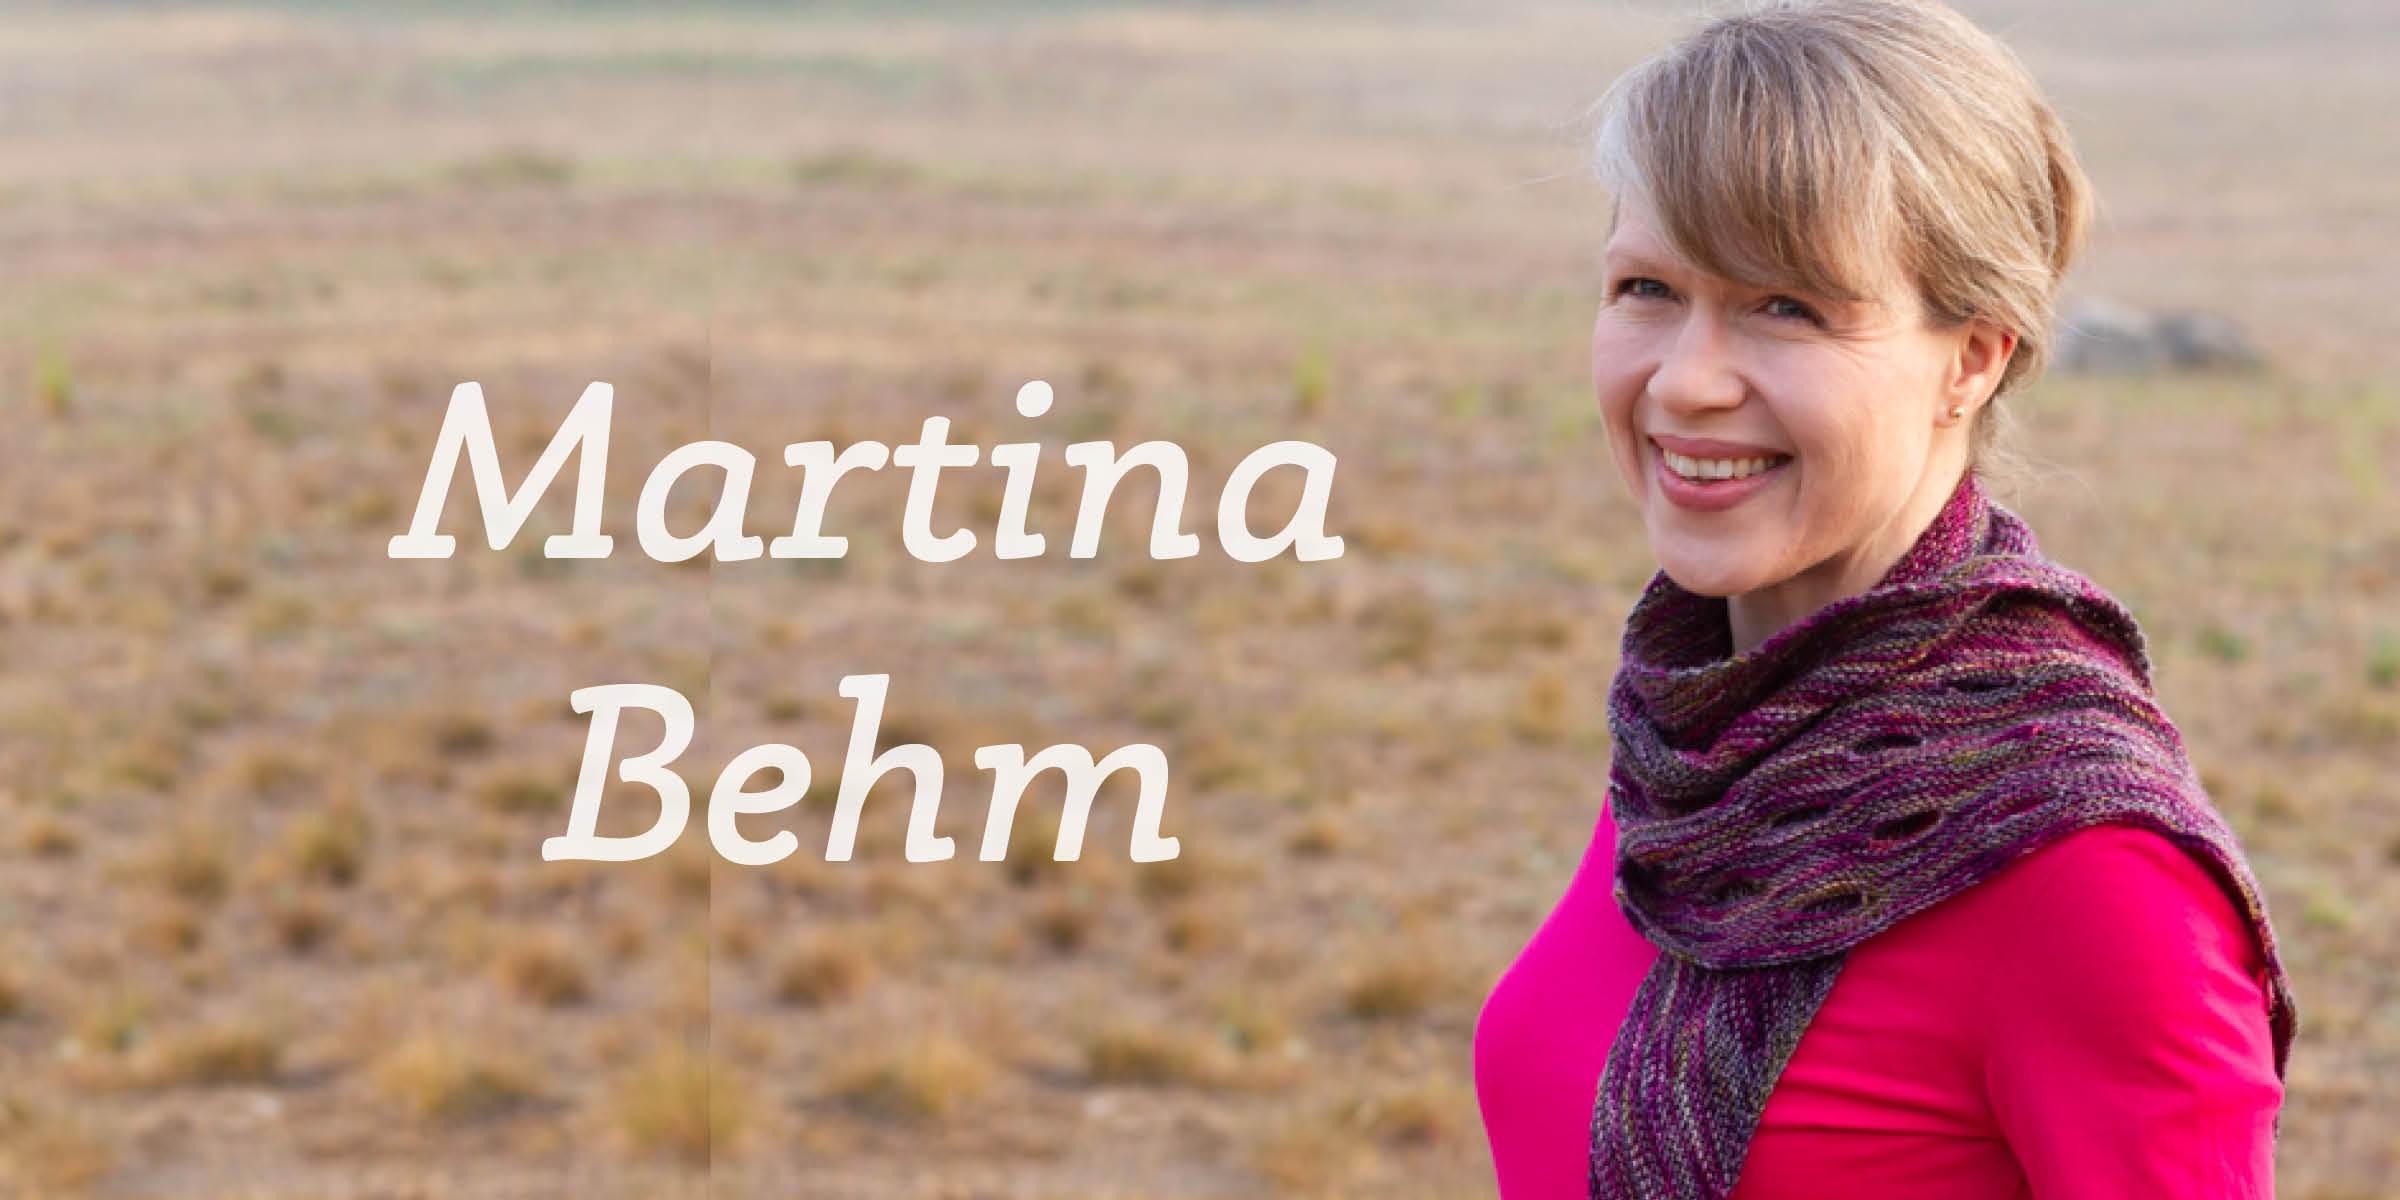 ShopbannerAnders-Martina